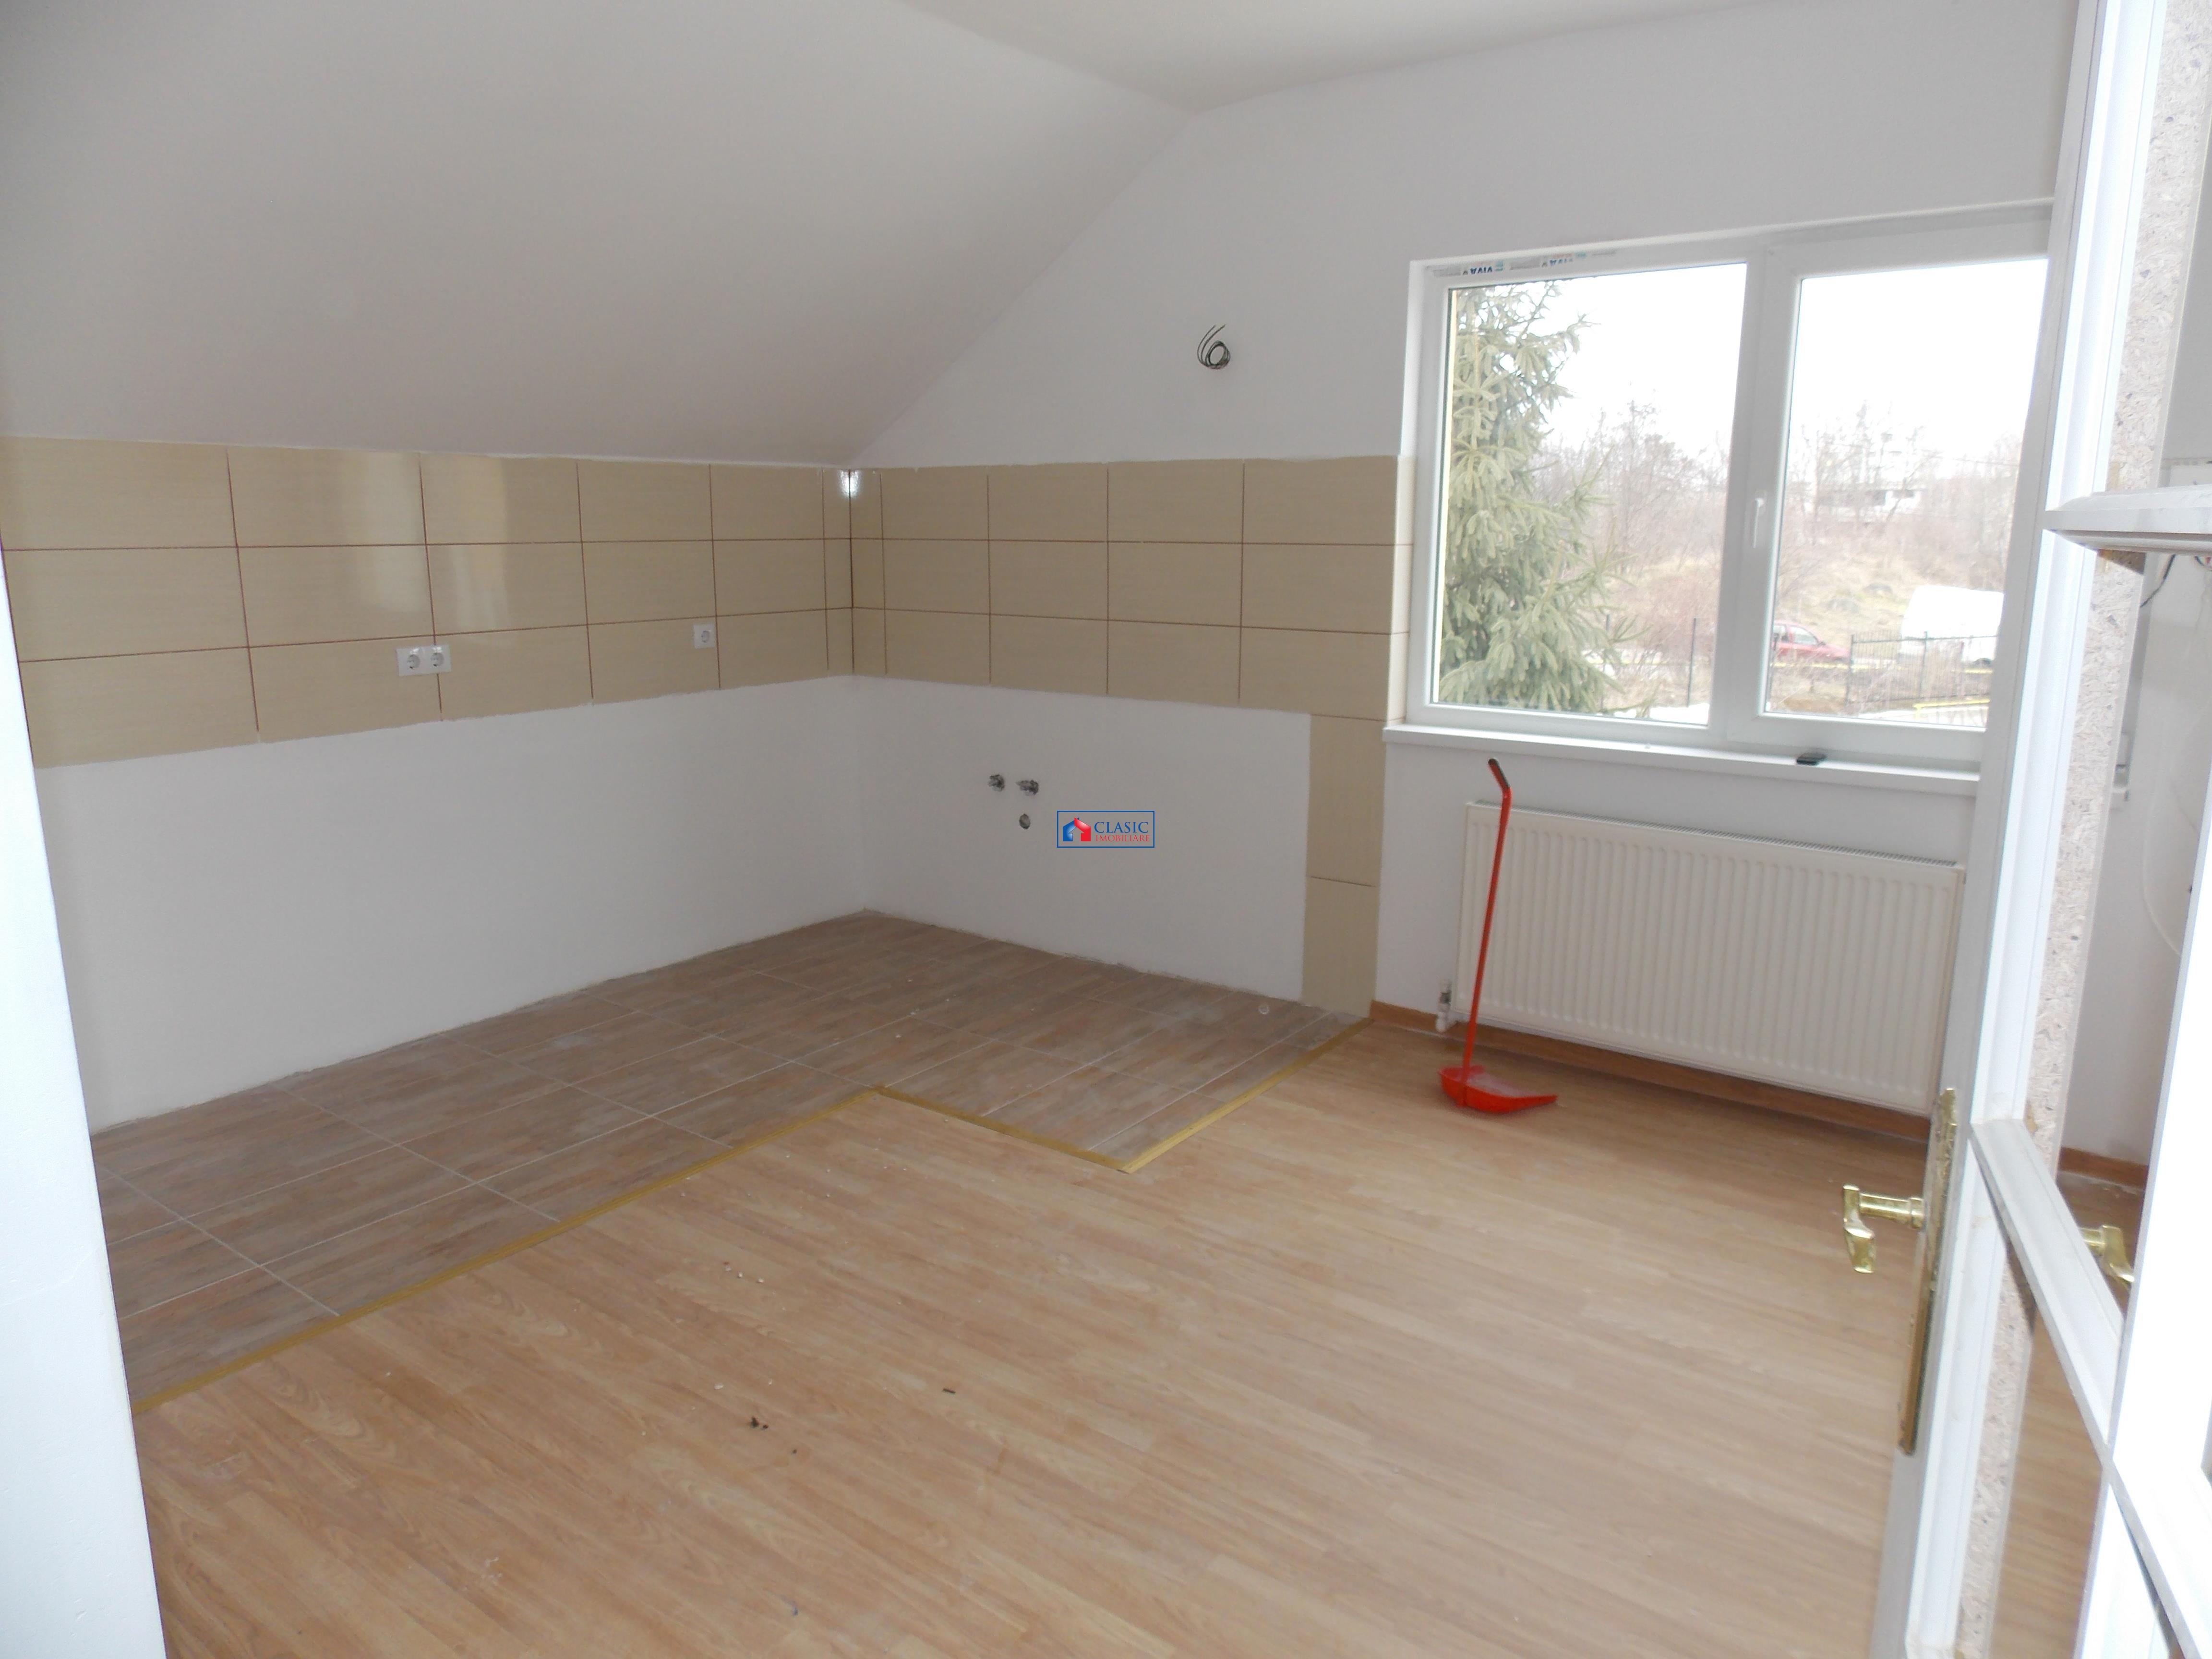 Vanzare casa individuala 6 camere recent renovata Manastur